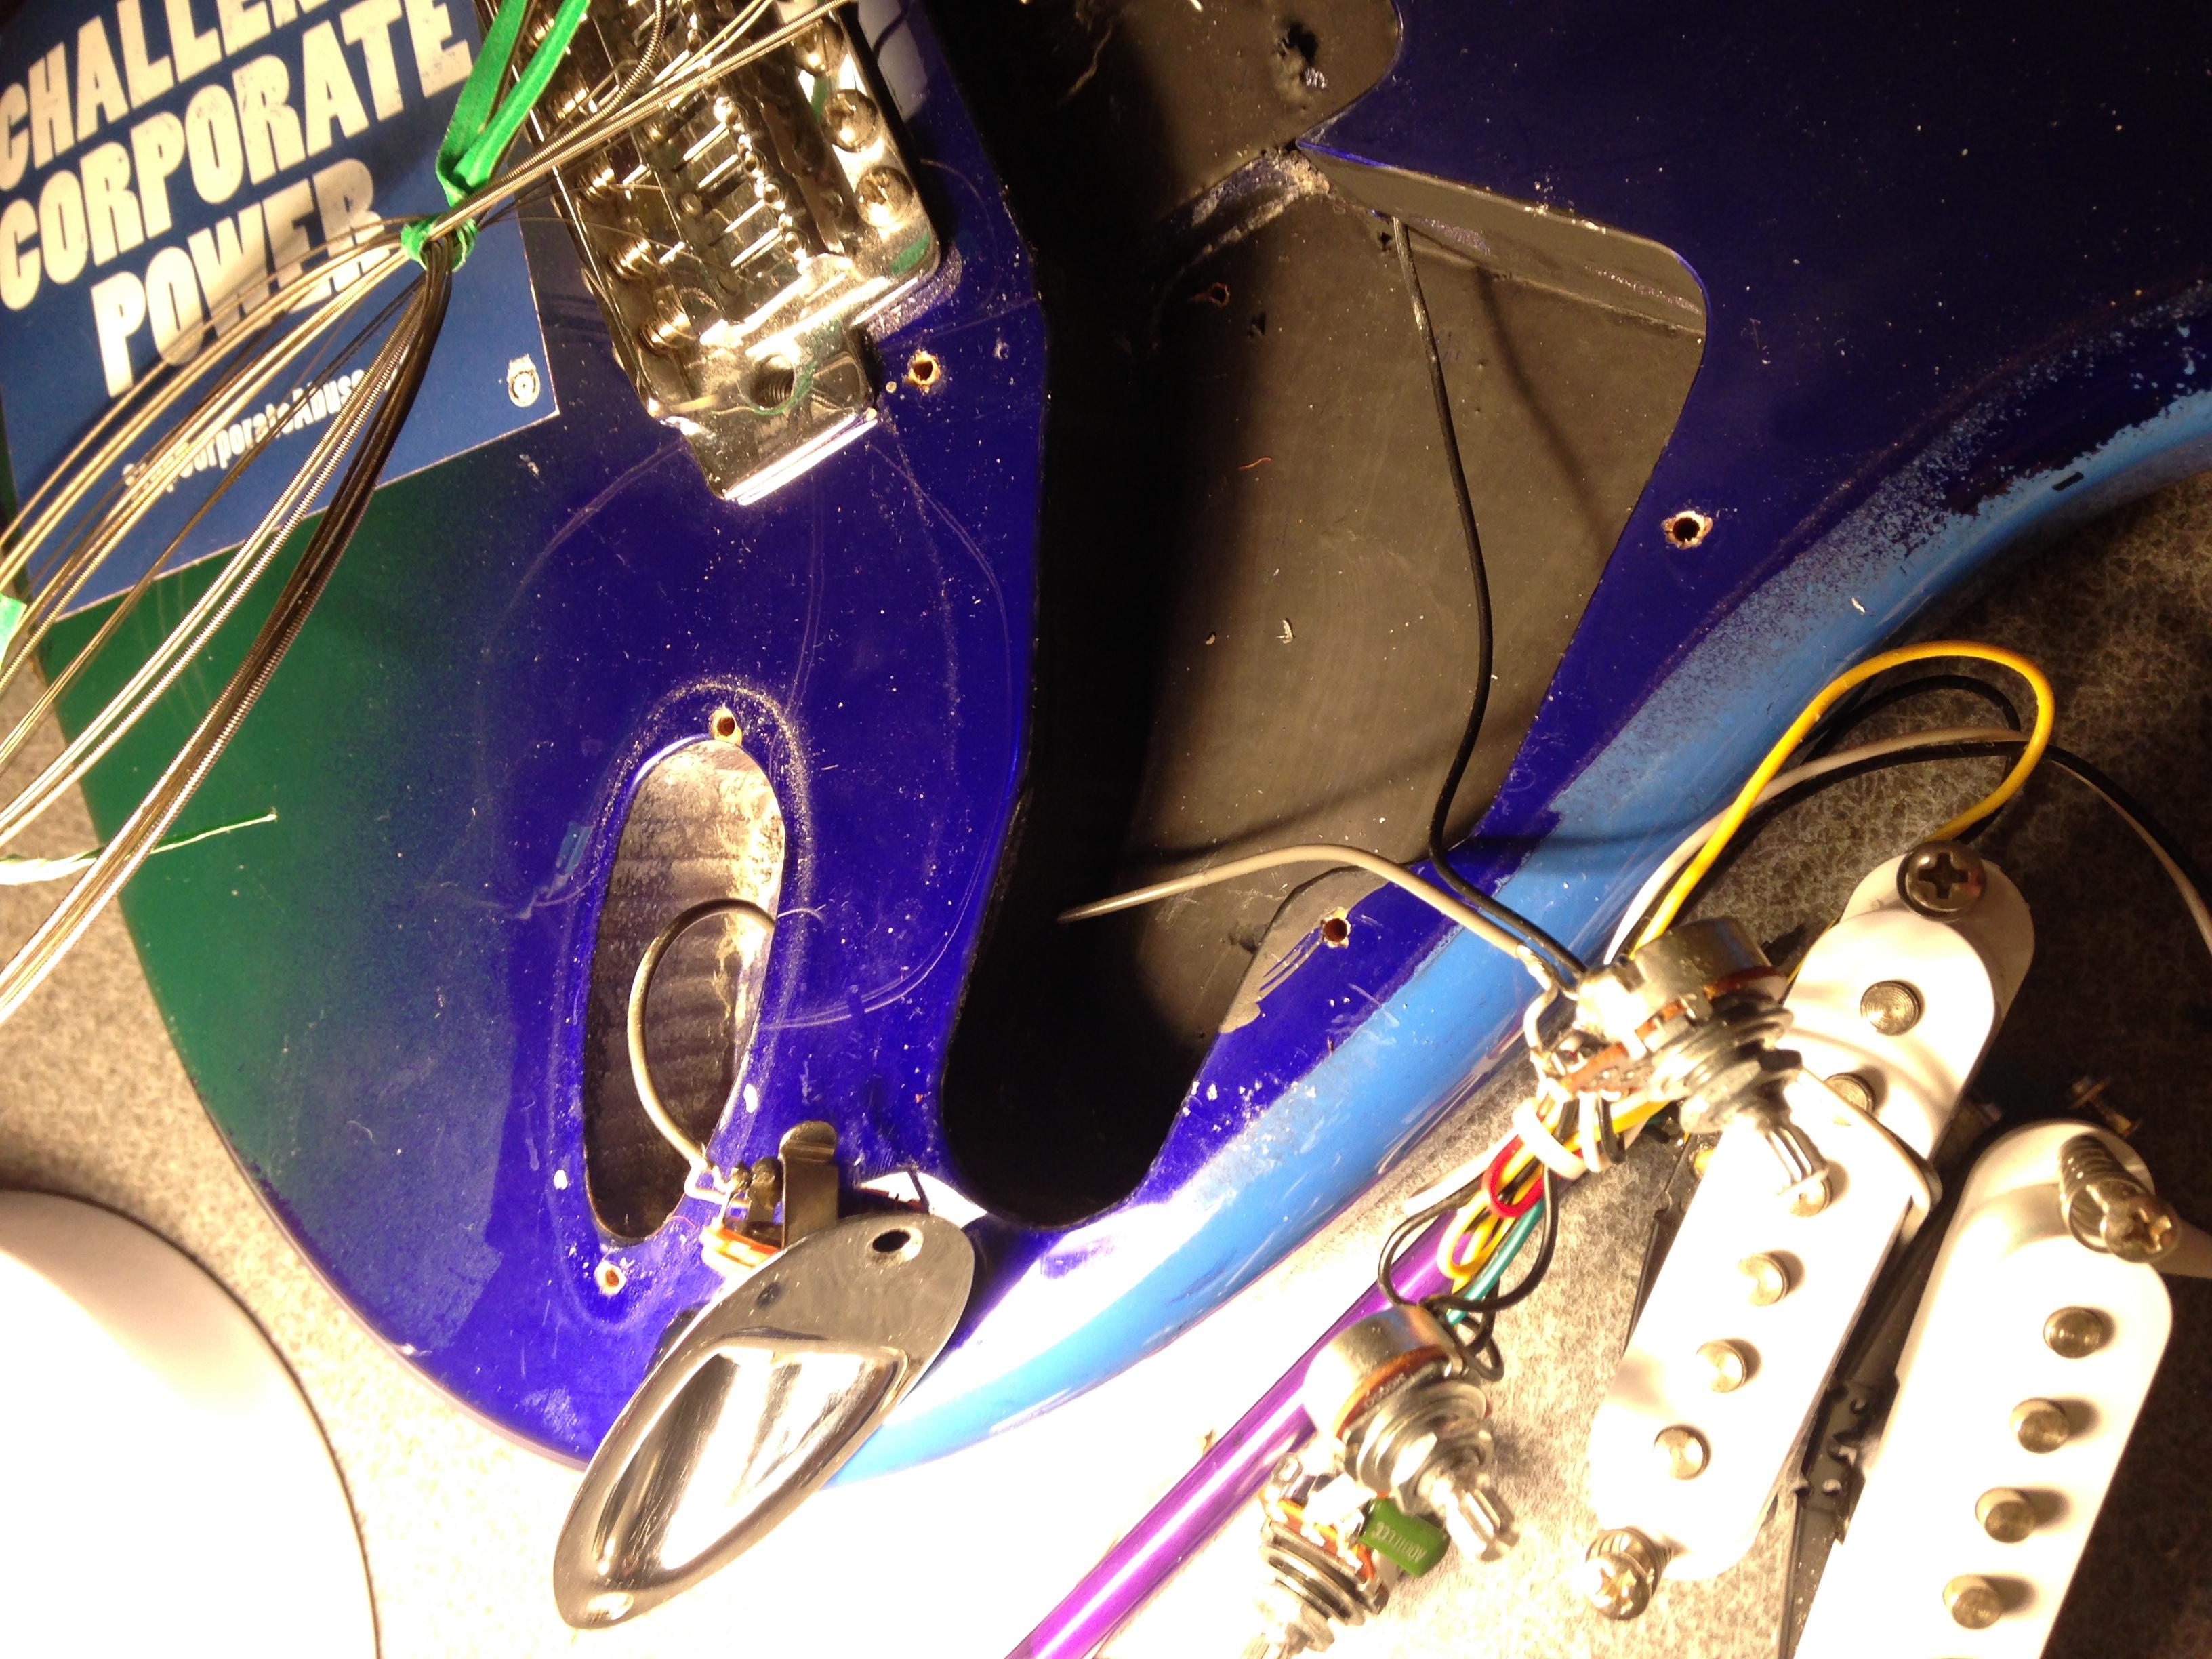 Electric Guitar Build – Bray Lab